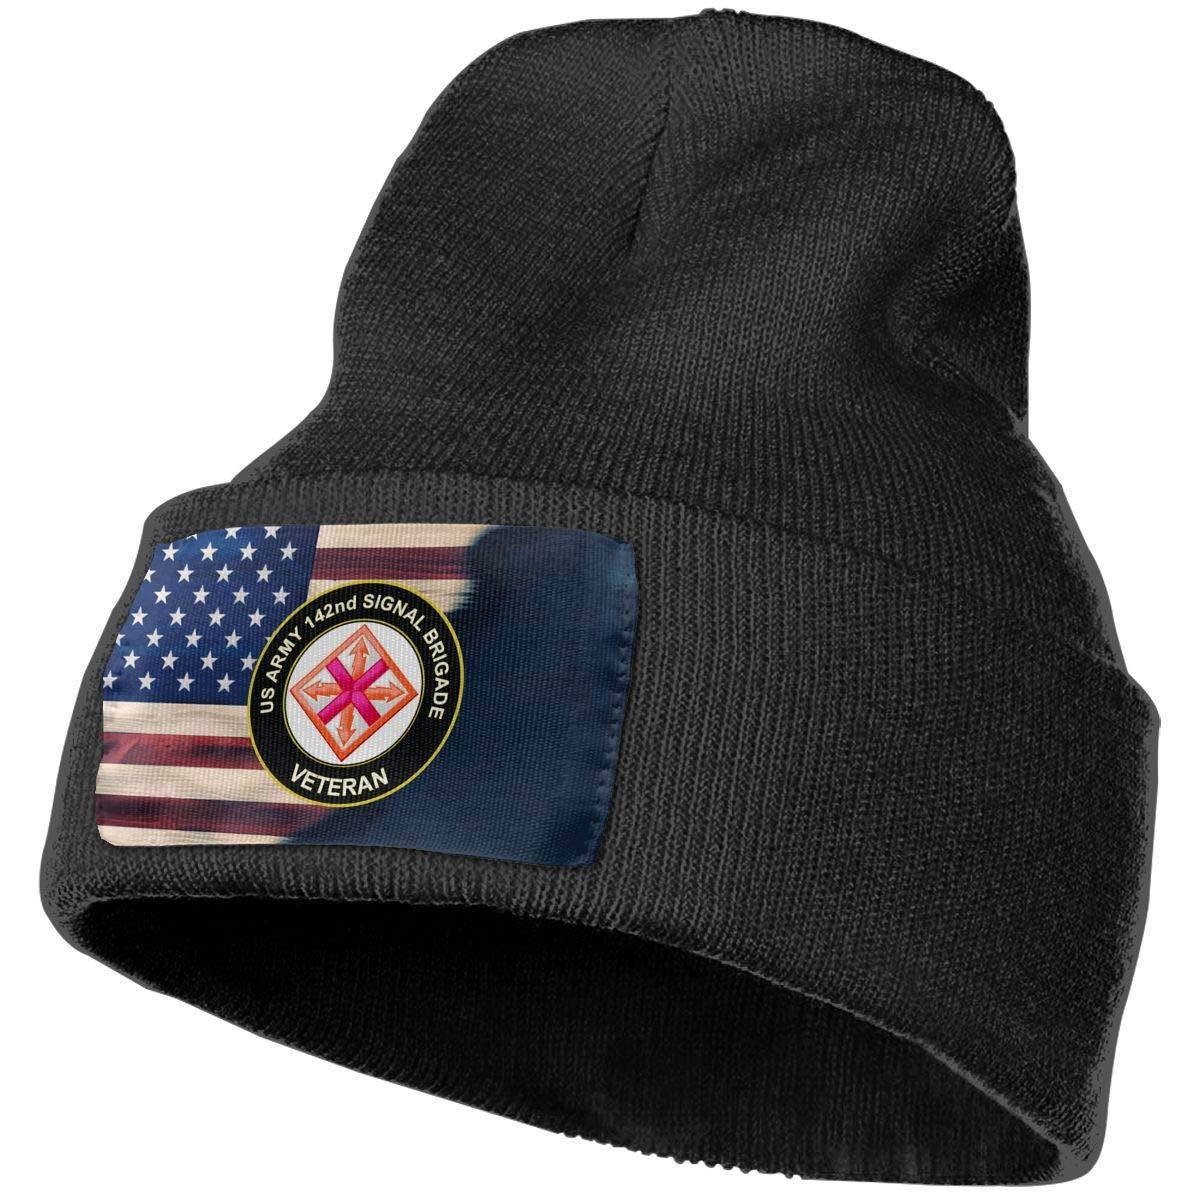 US Army 142nd Signal Brigade Veteran Mens Beanie Cap Skull Cap Winter Warm Knitting Hats.